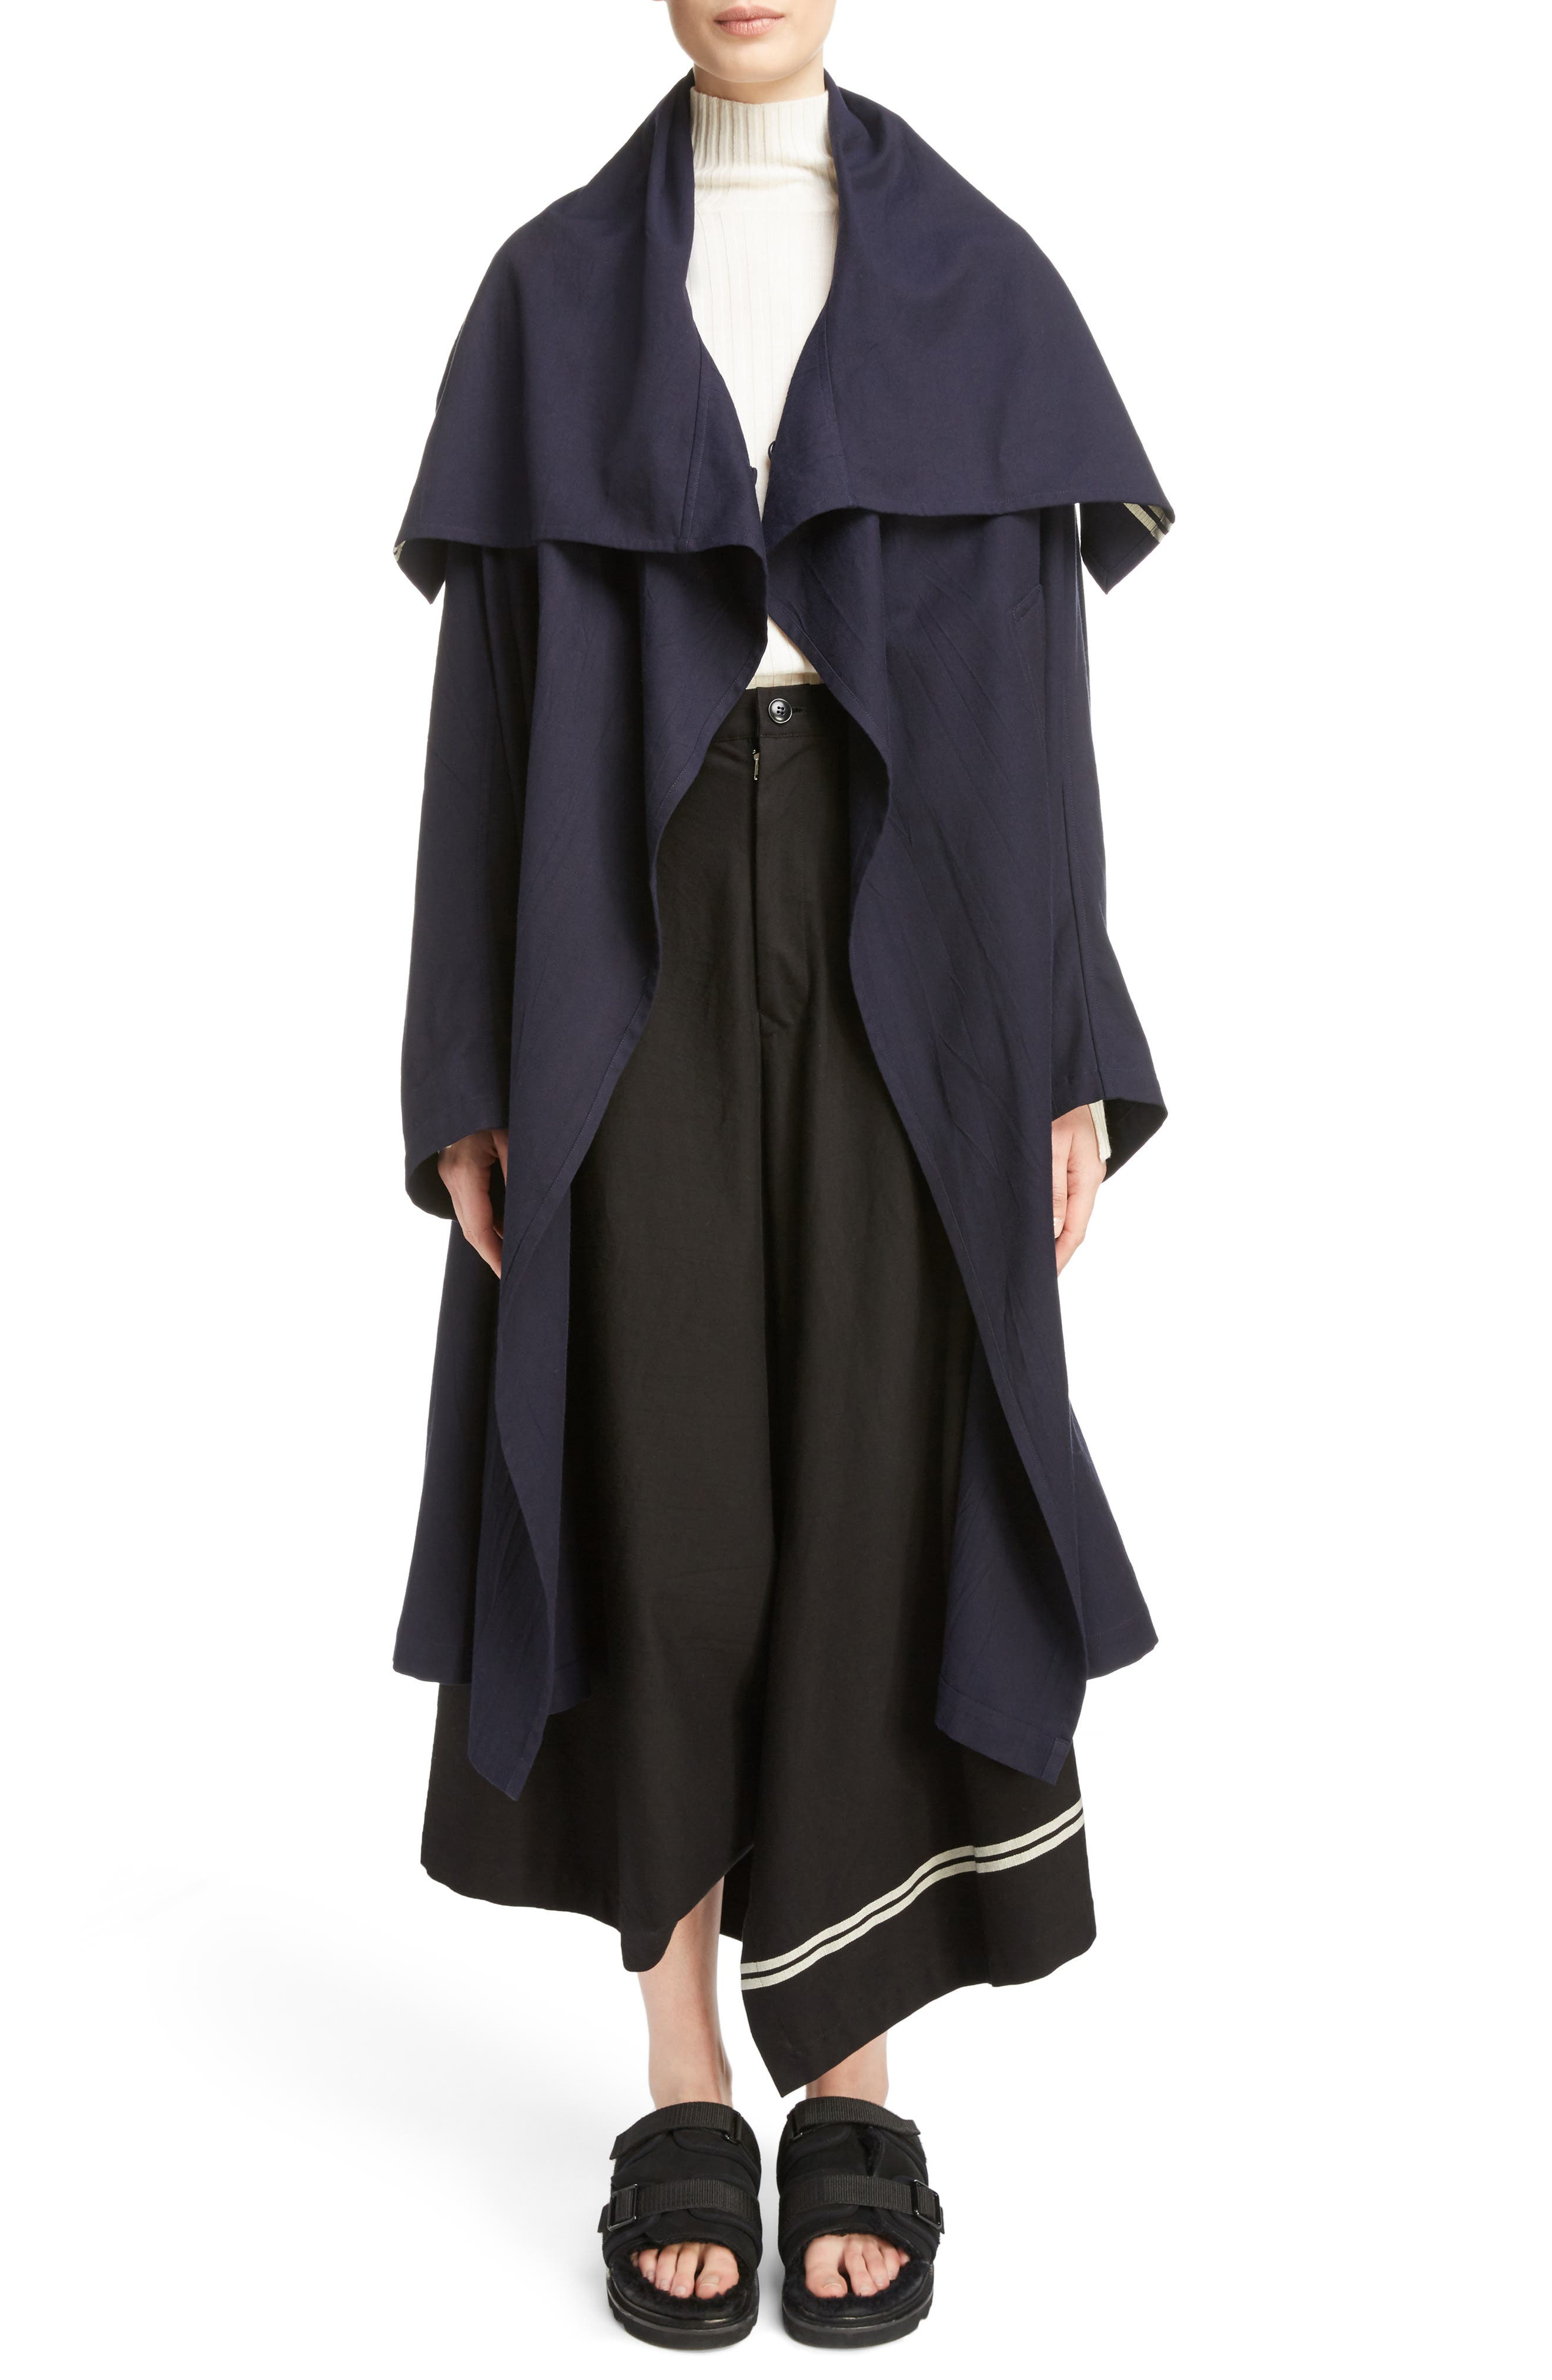 Main Image - Y's by Yohji Yamamoto Drape Collar Coat